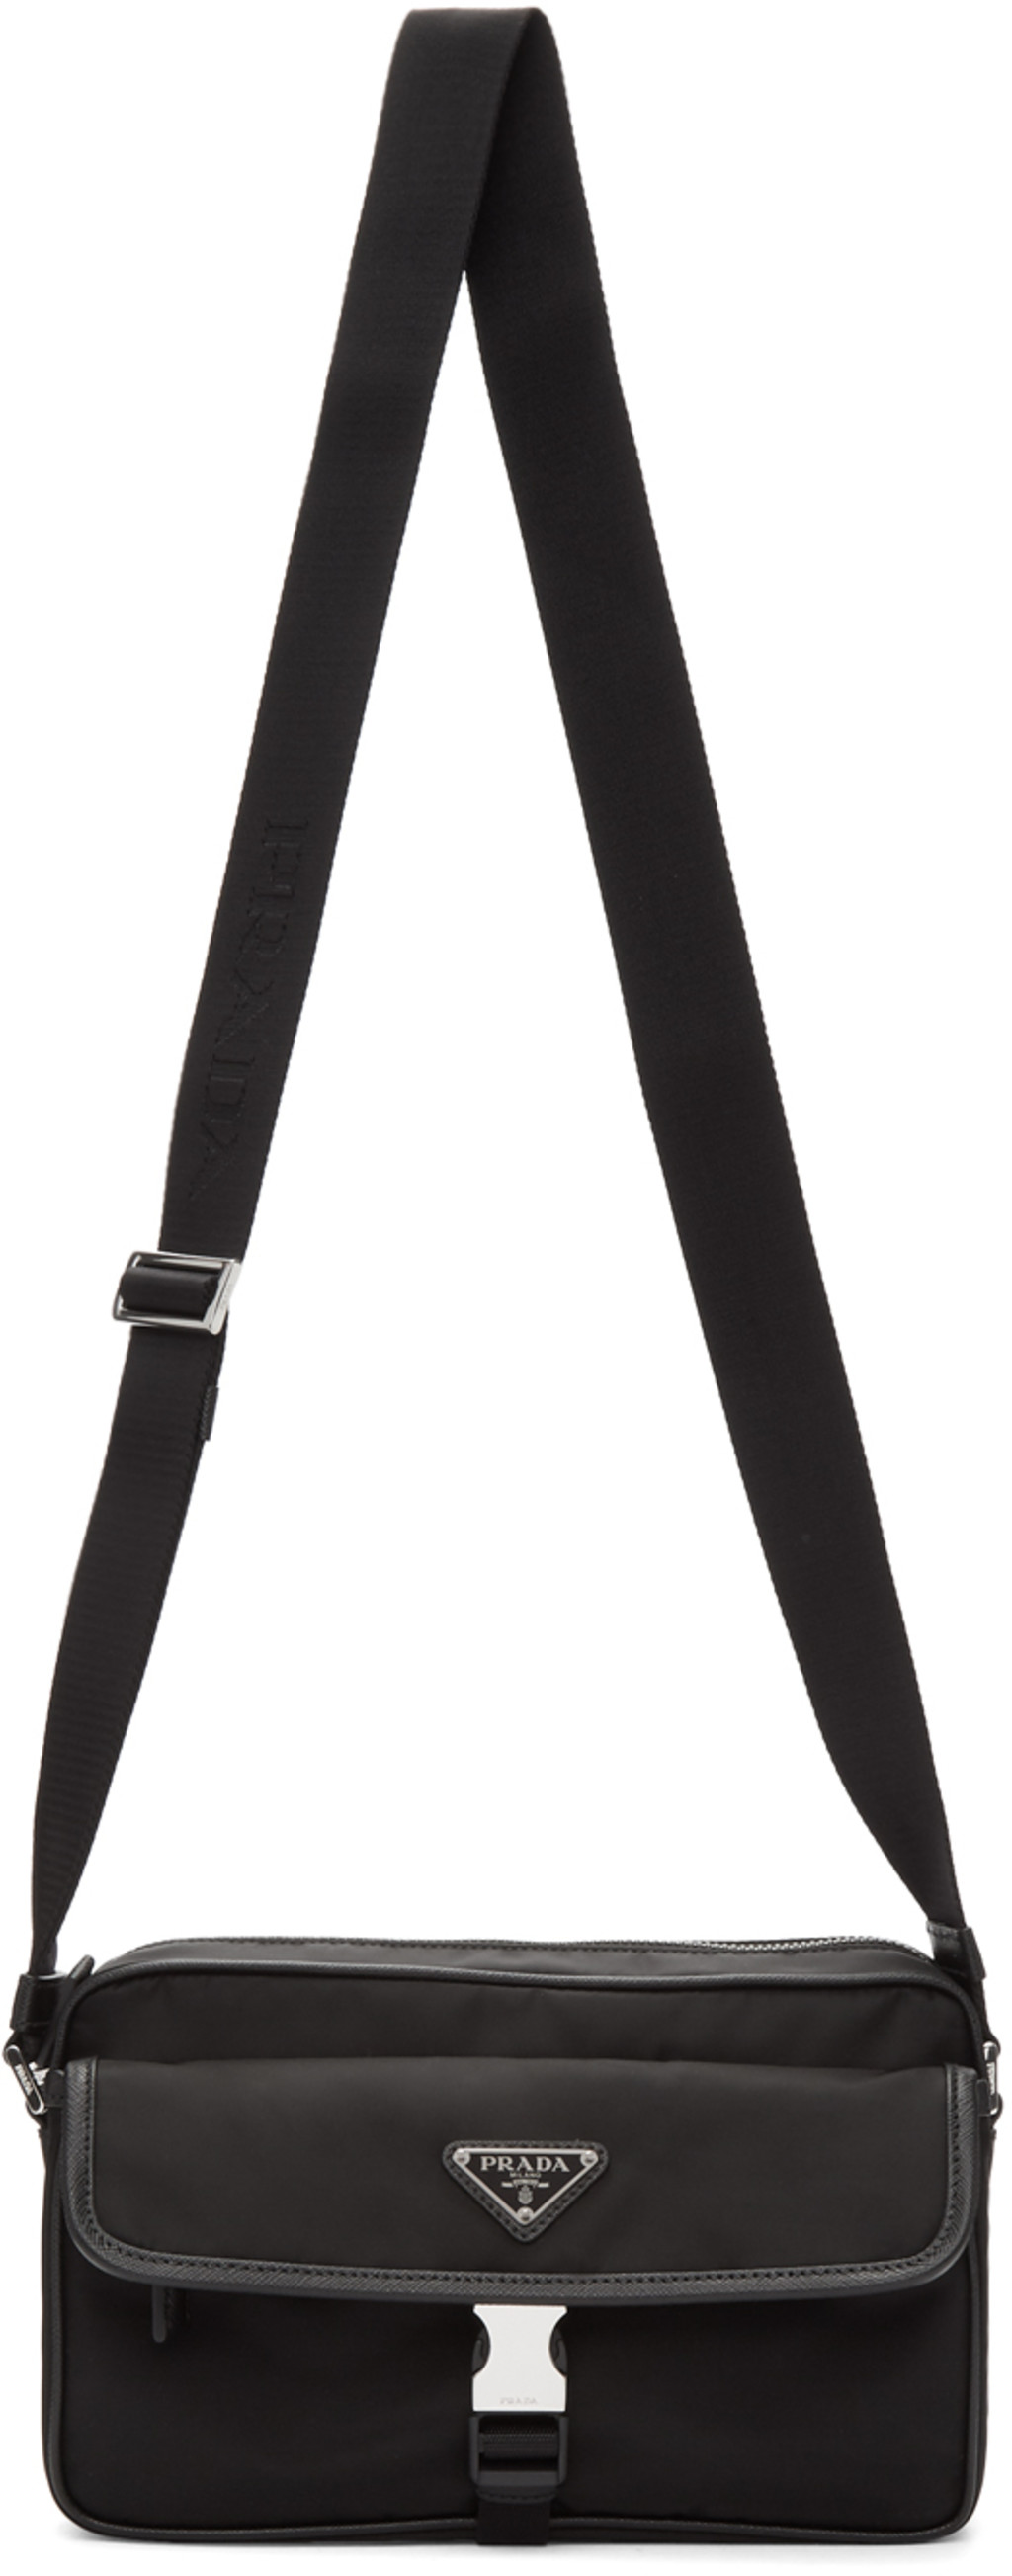 4154c7e803 Black Nylon Saffiano Messenger Bag